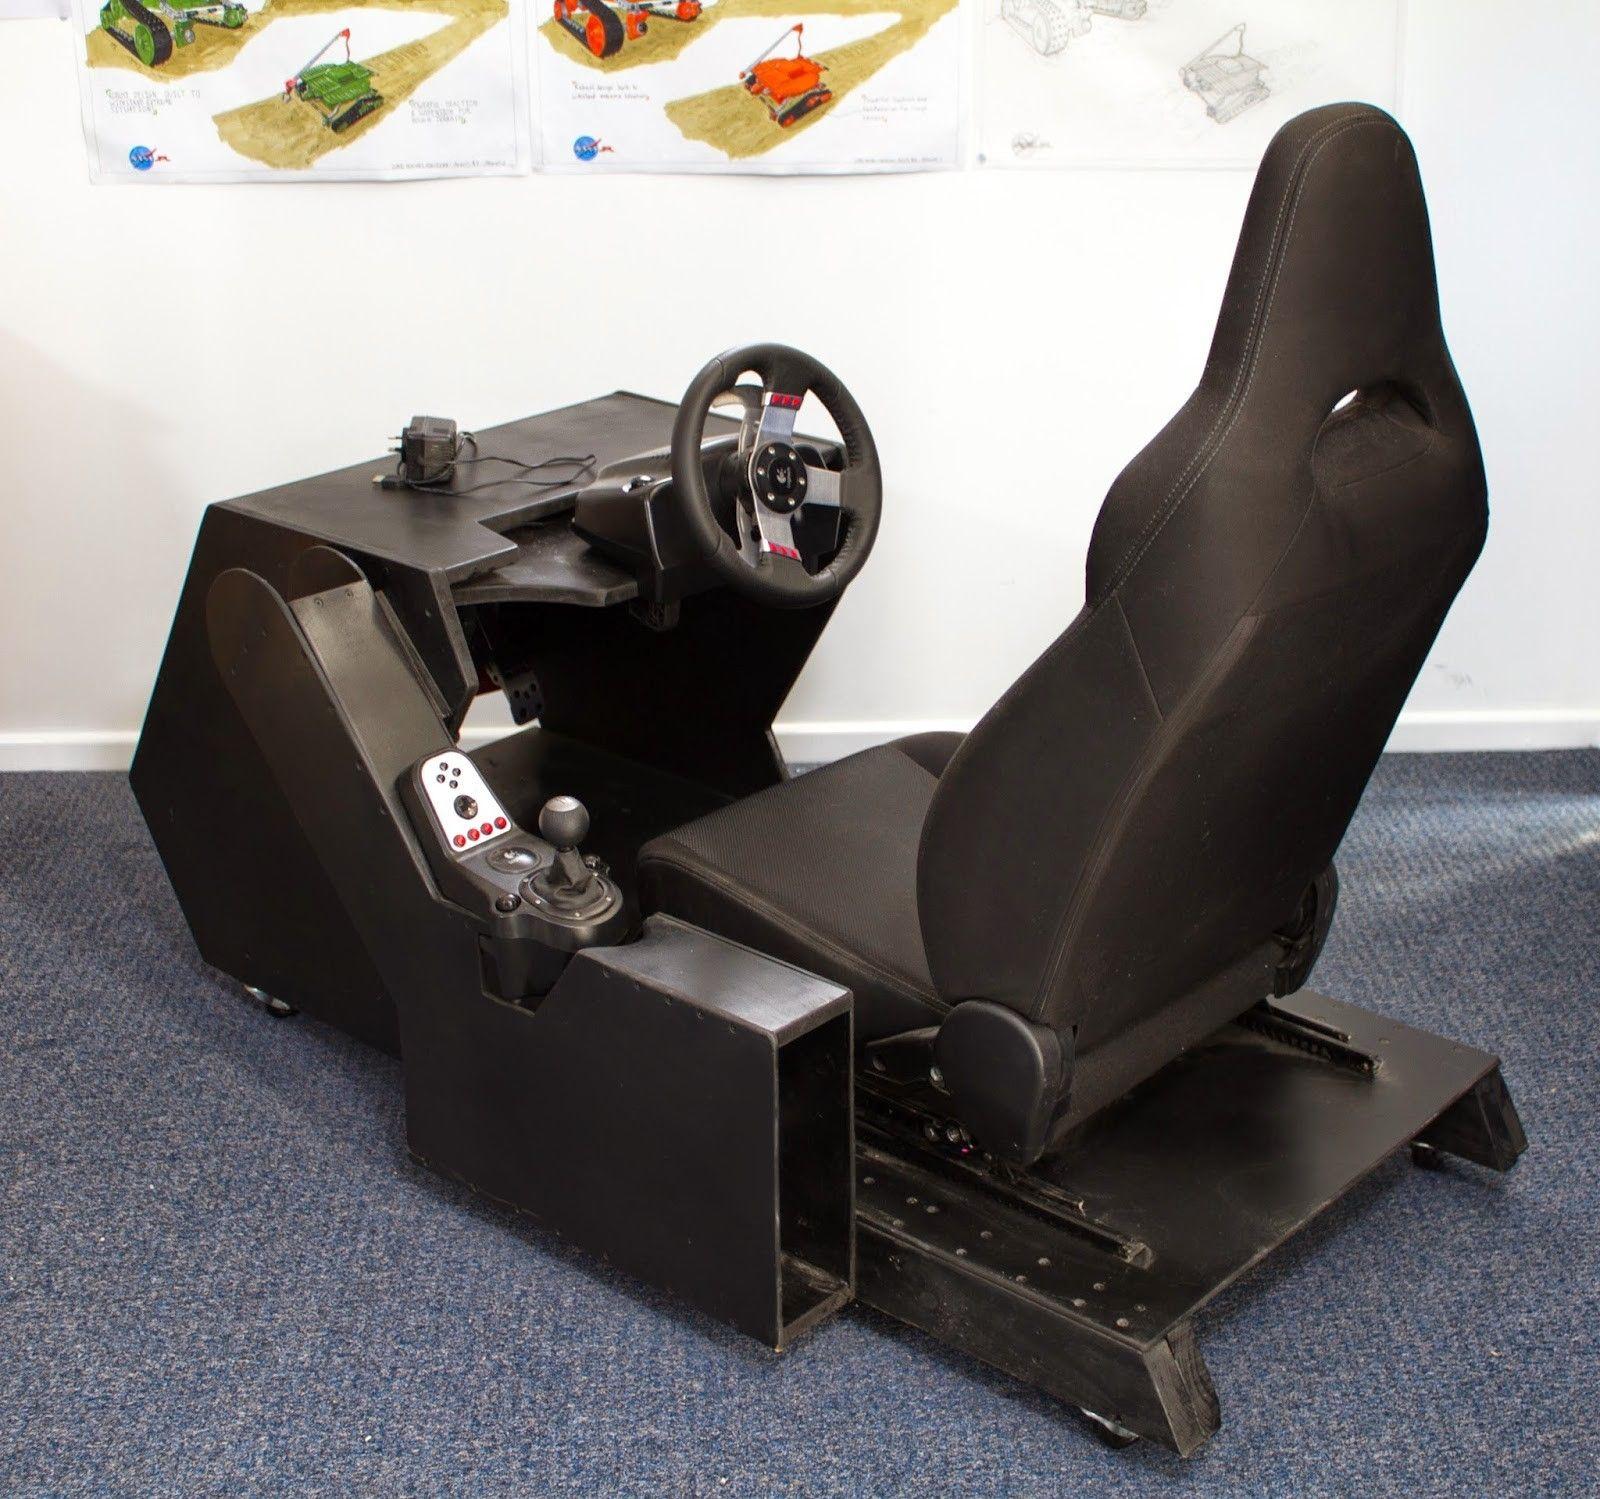 Racing Cockpit Simulator, Pencil Warriors on ArtStation at